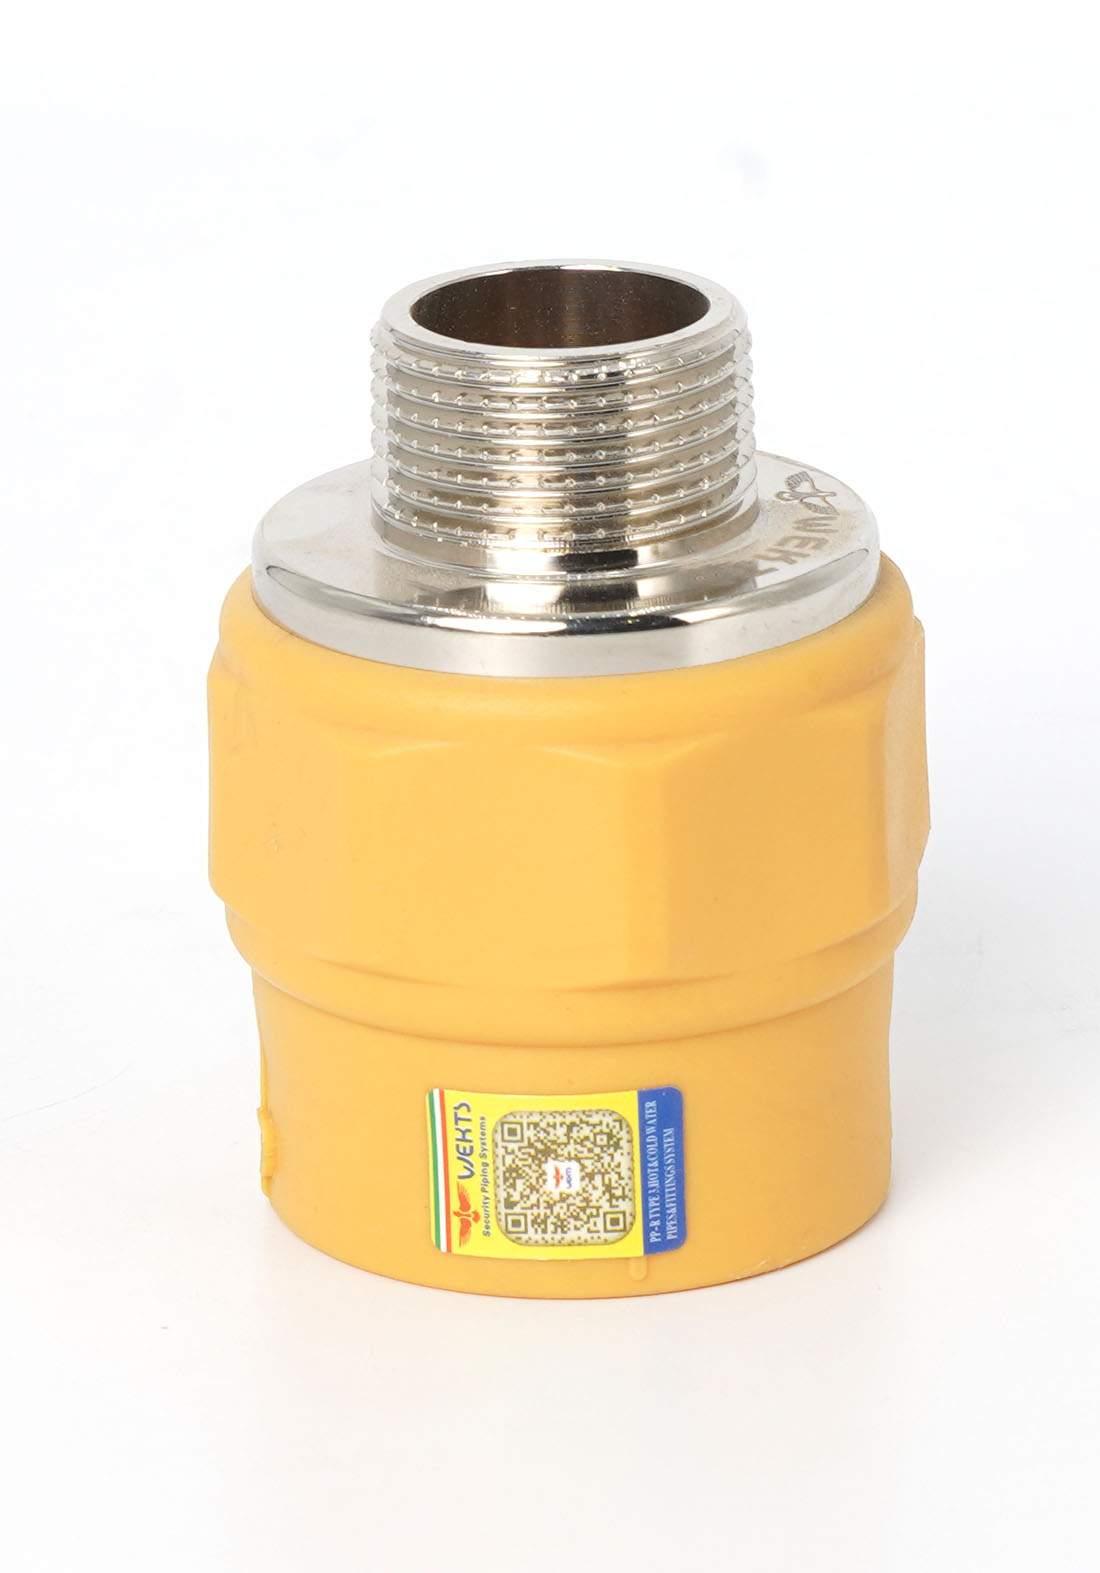 "Wekts 5120 Connector Pipe /Adapter  25 × 3/4"" سن  انابيب   ماء خارجي"